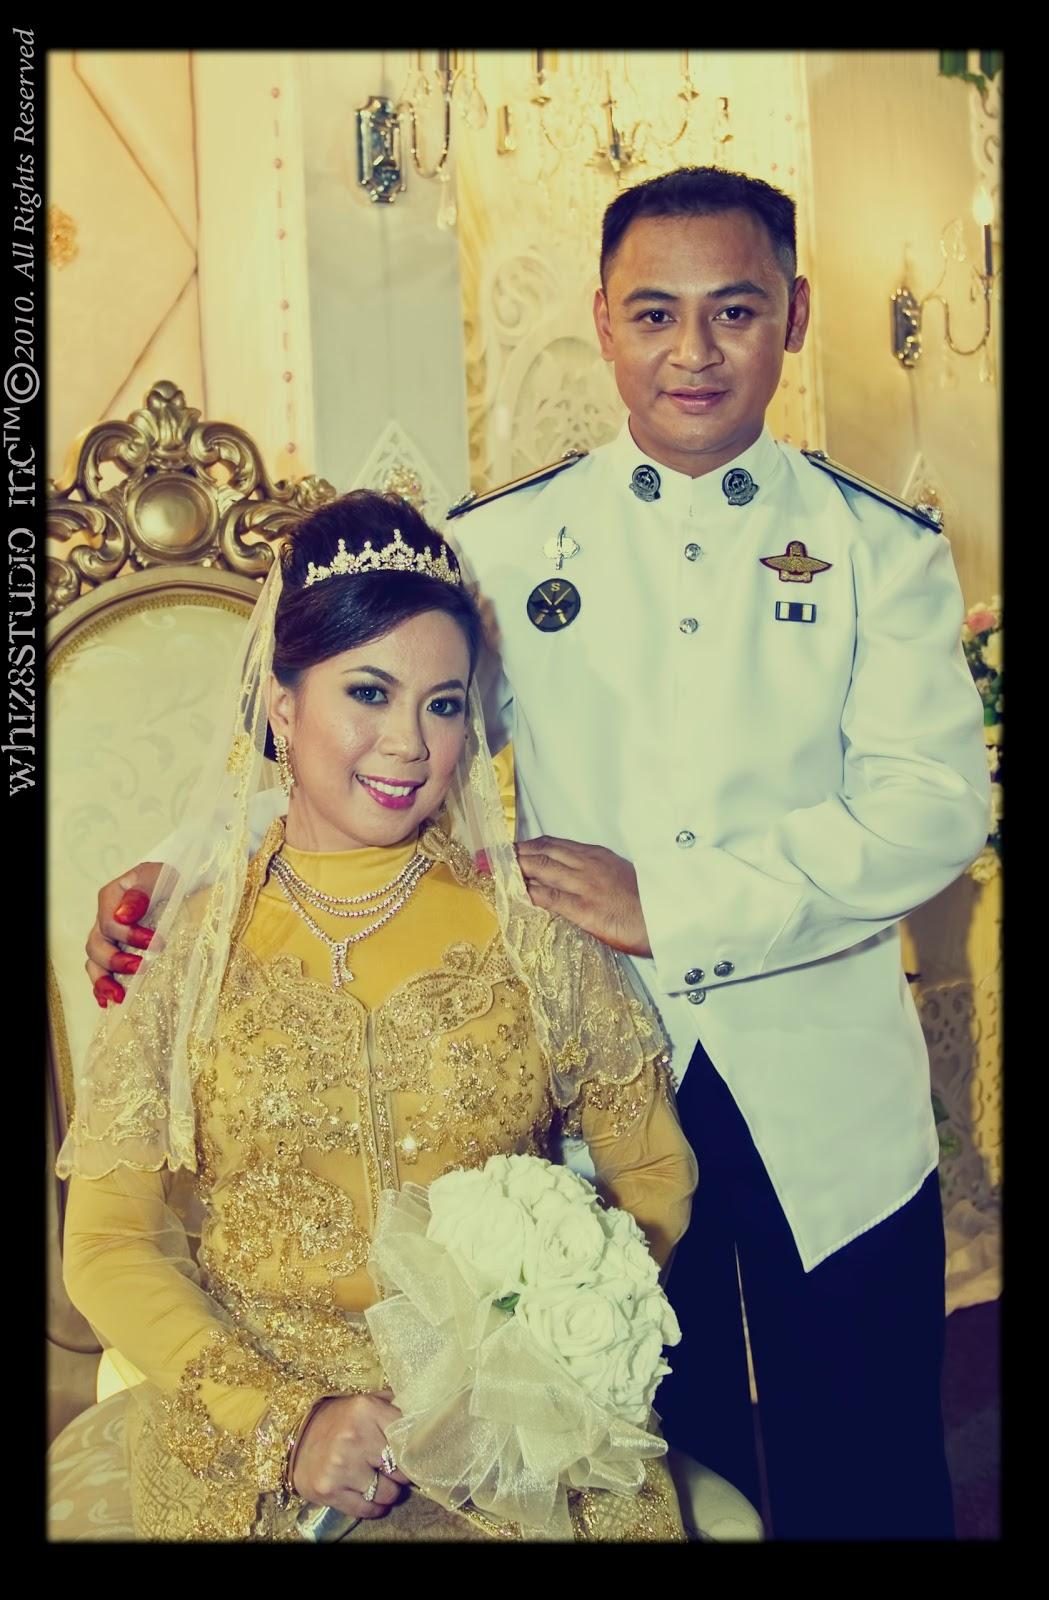 my cousin s wedding